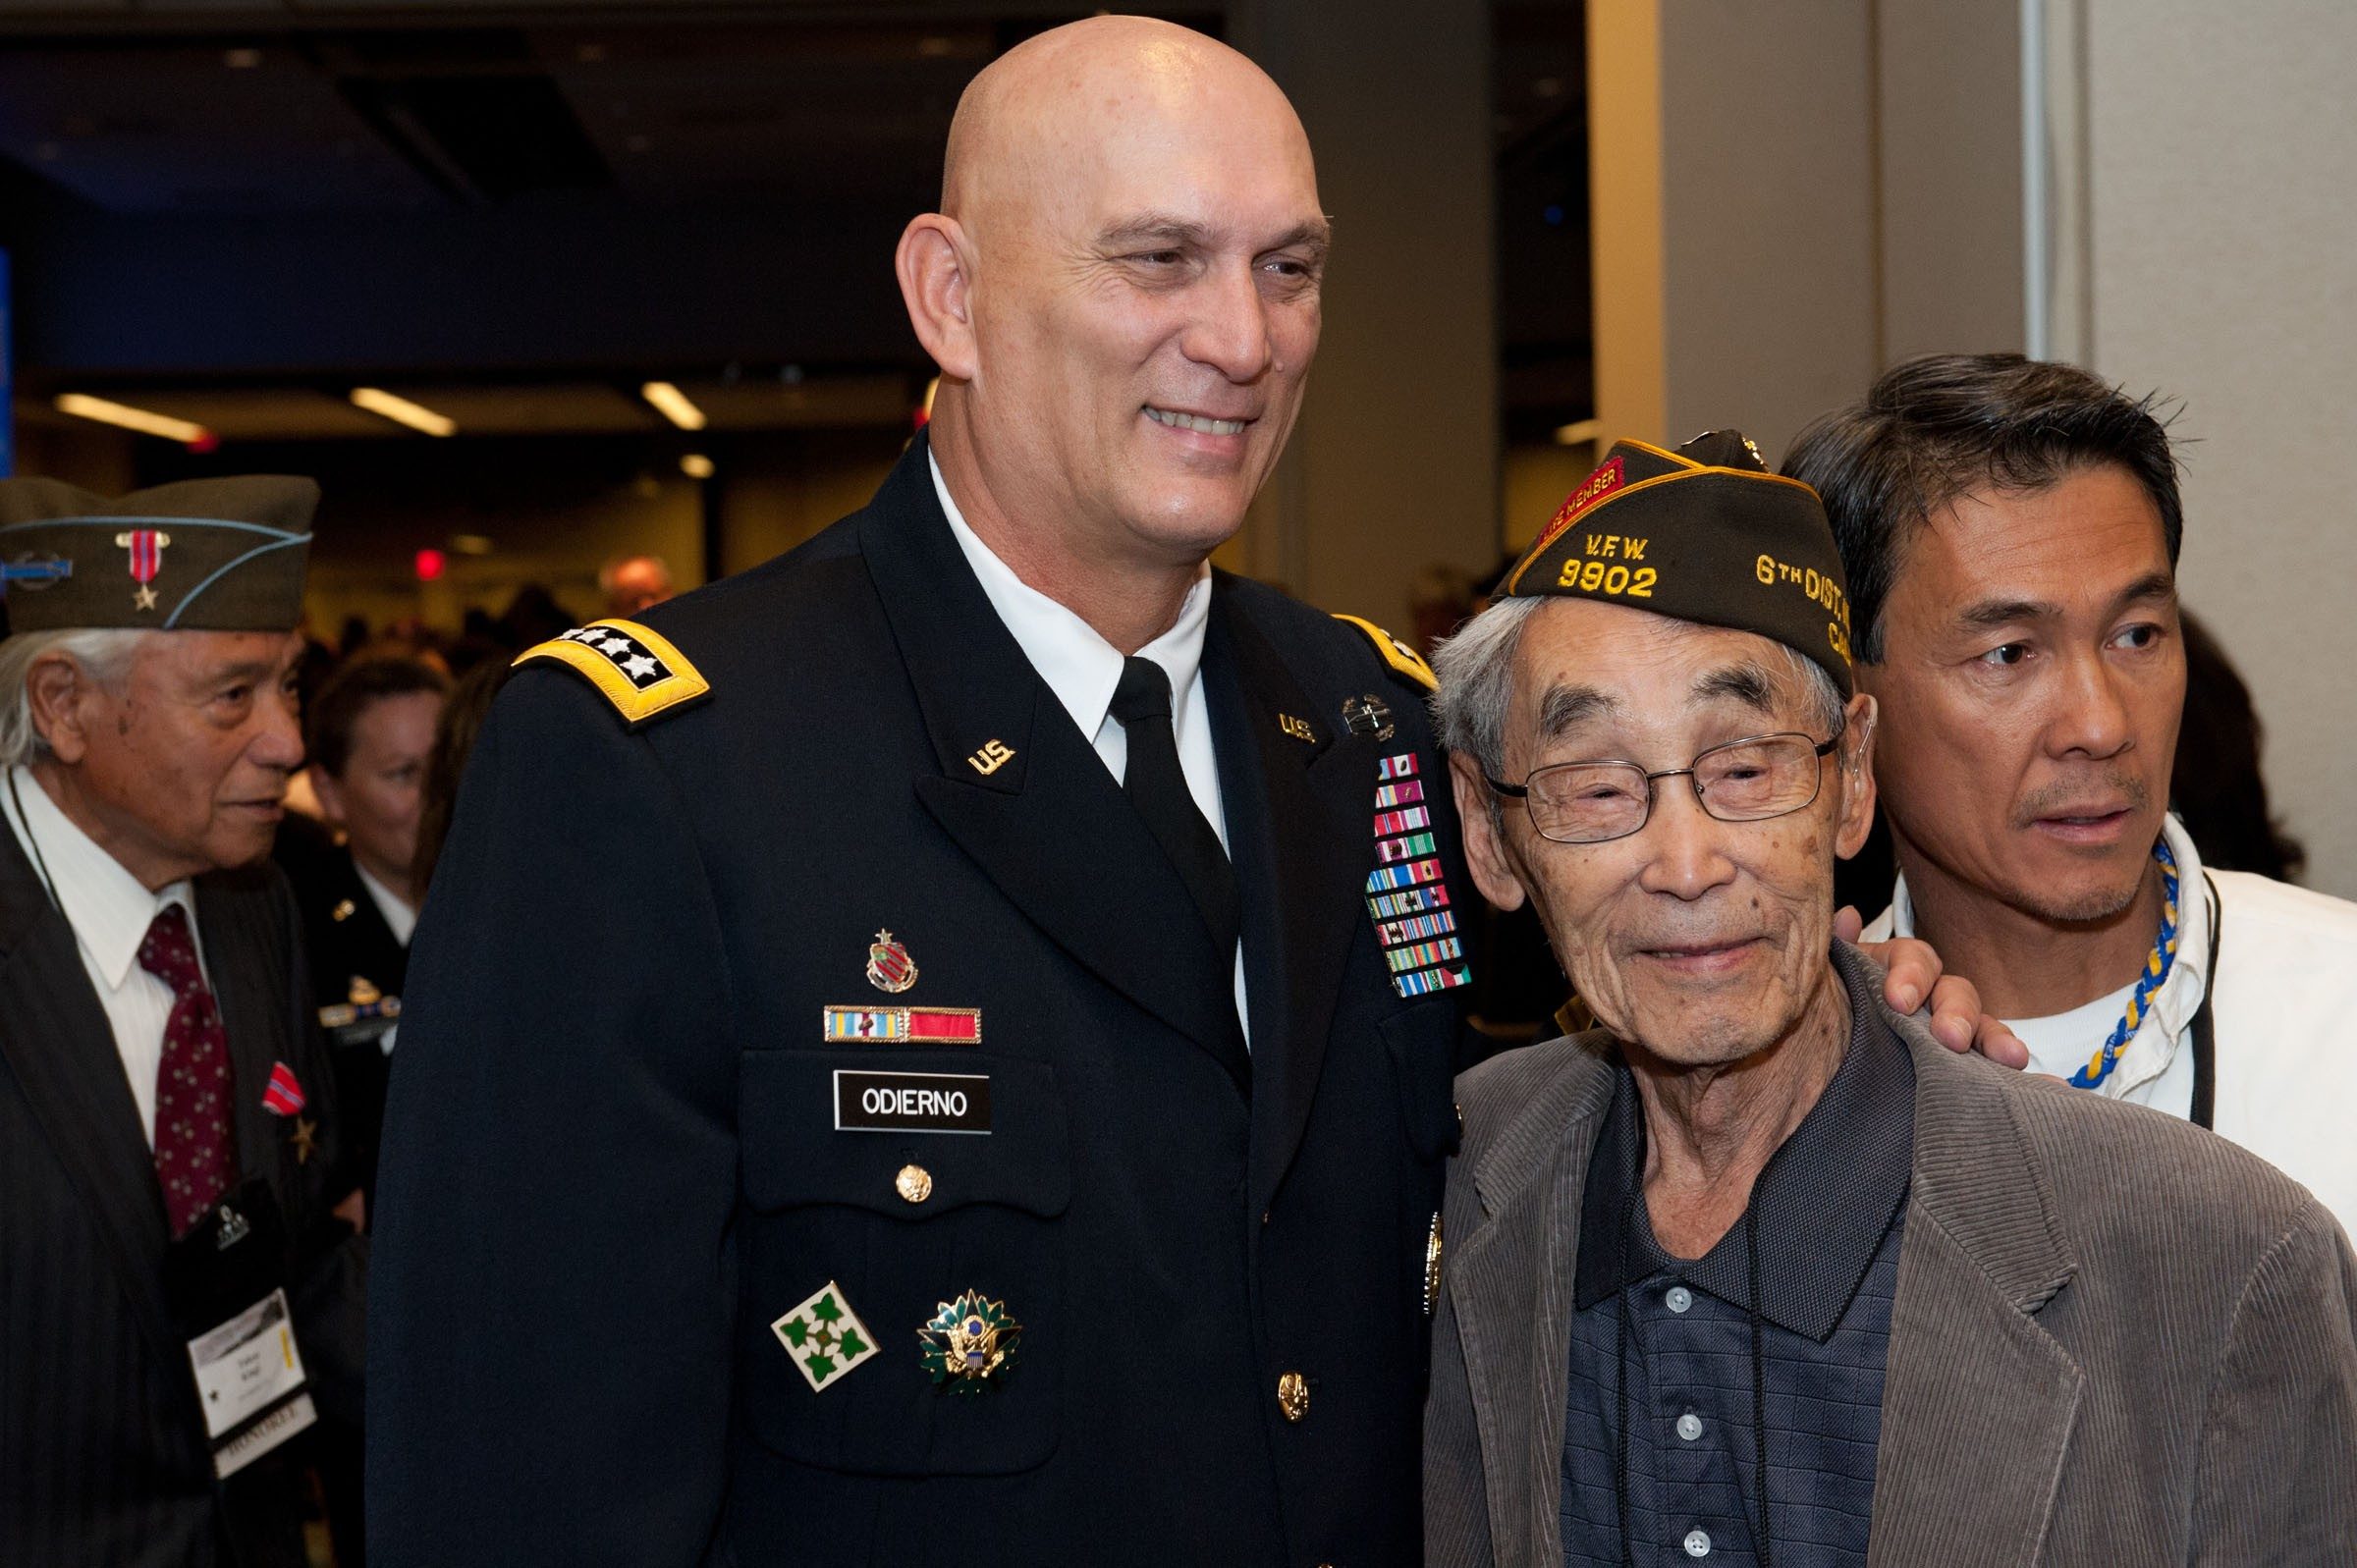 Nisei WWII Veterans receive Bronze Star | Article | The